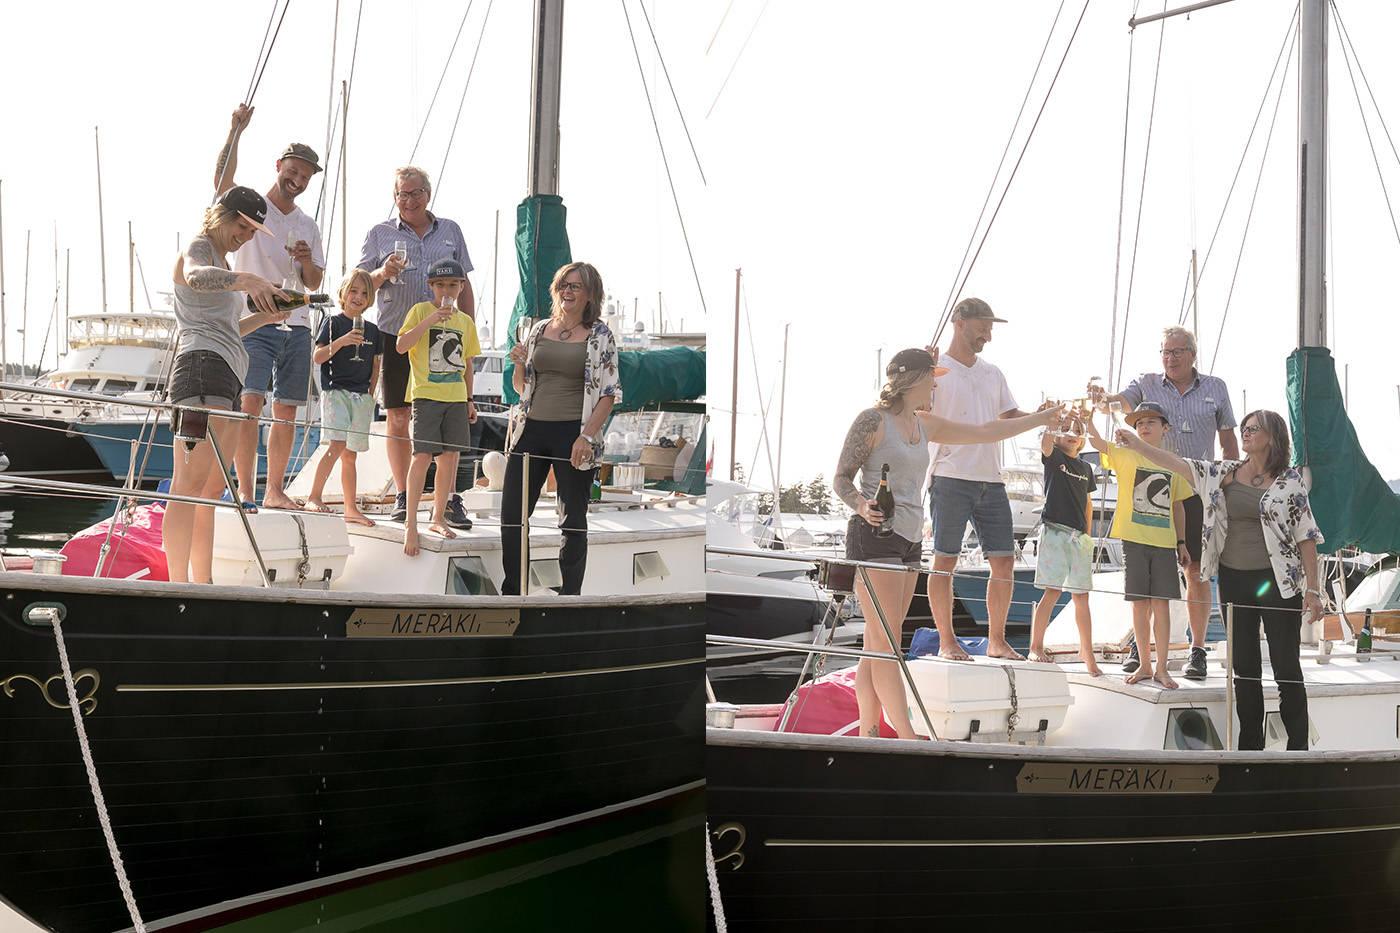 The family celebrates getting Meraki in the water. (Courtesy Kate Coles)